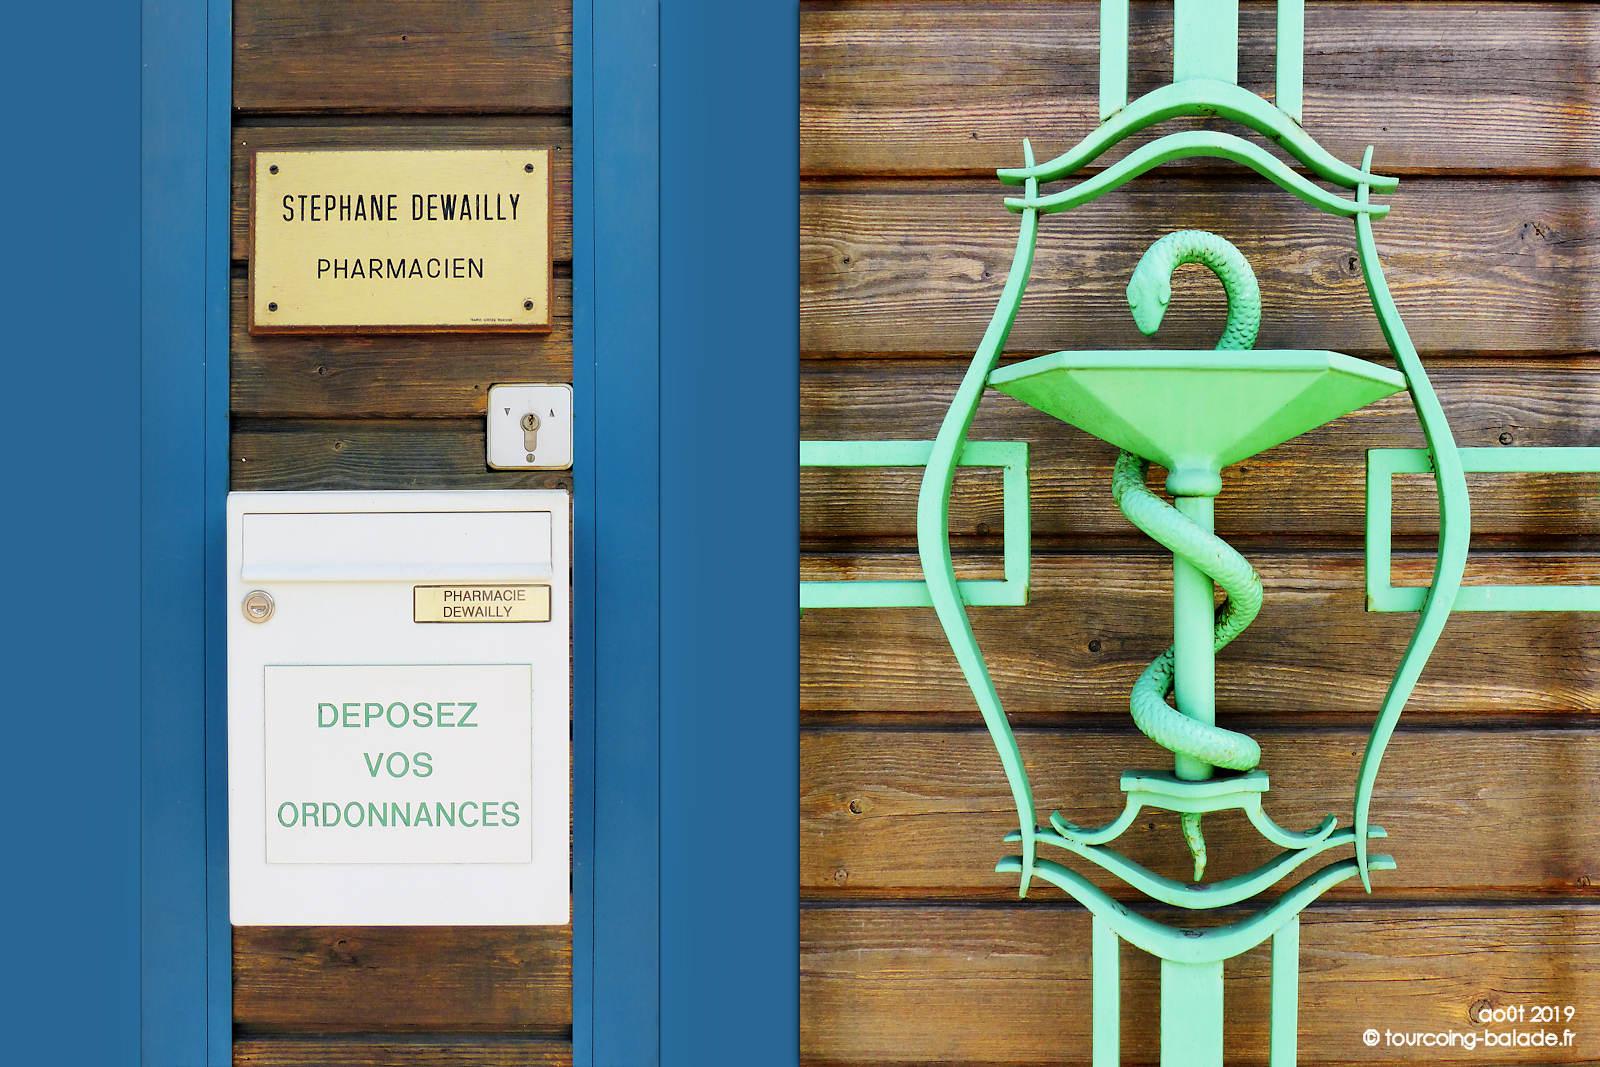 Pharmacie Dewailly Tourcoing - Coupe d'Hygie Caducée